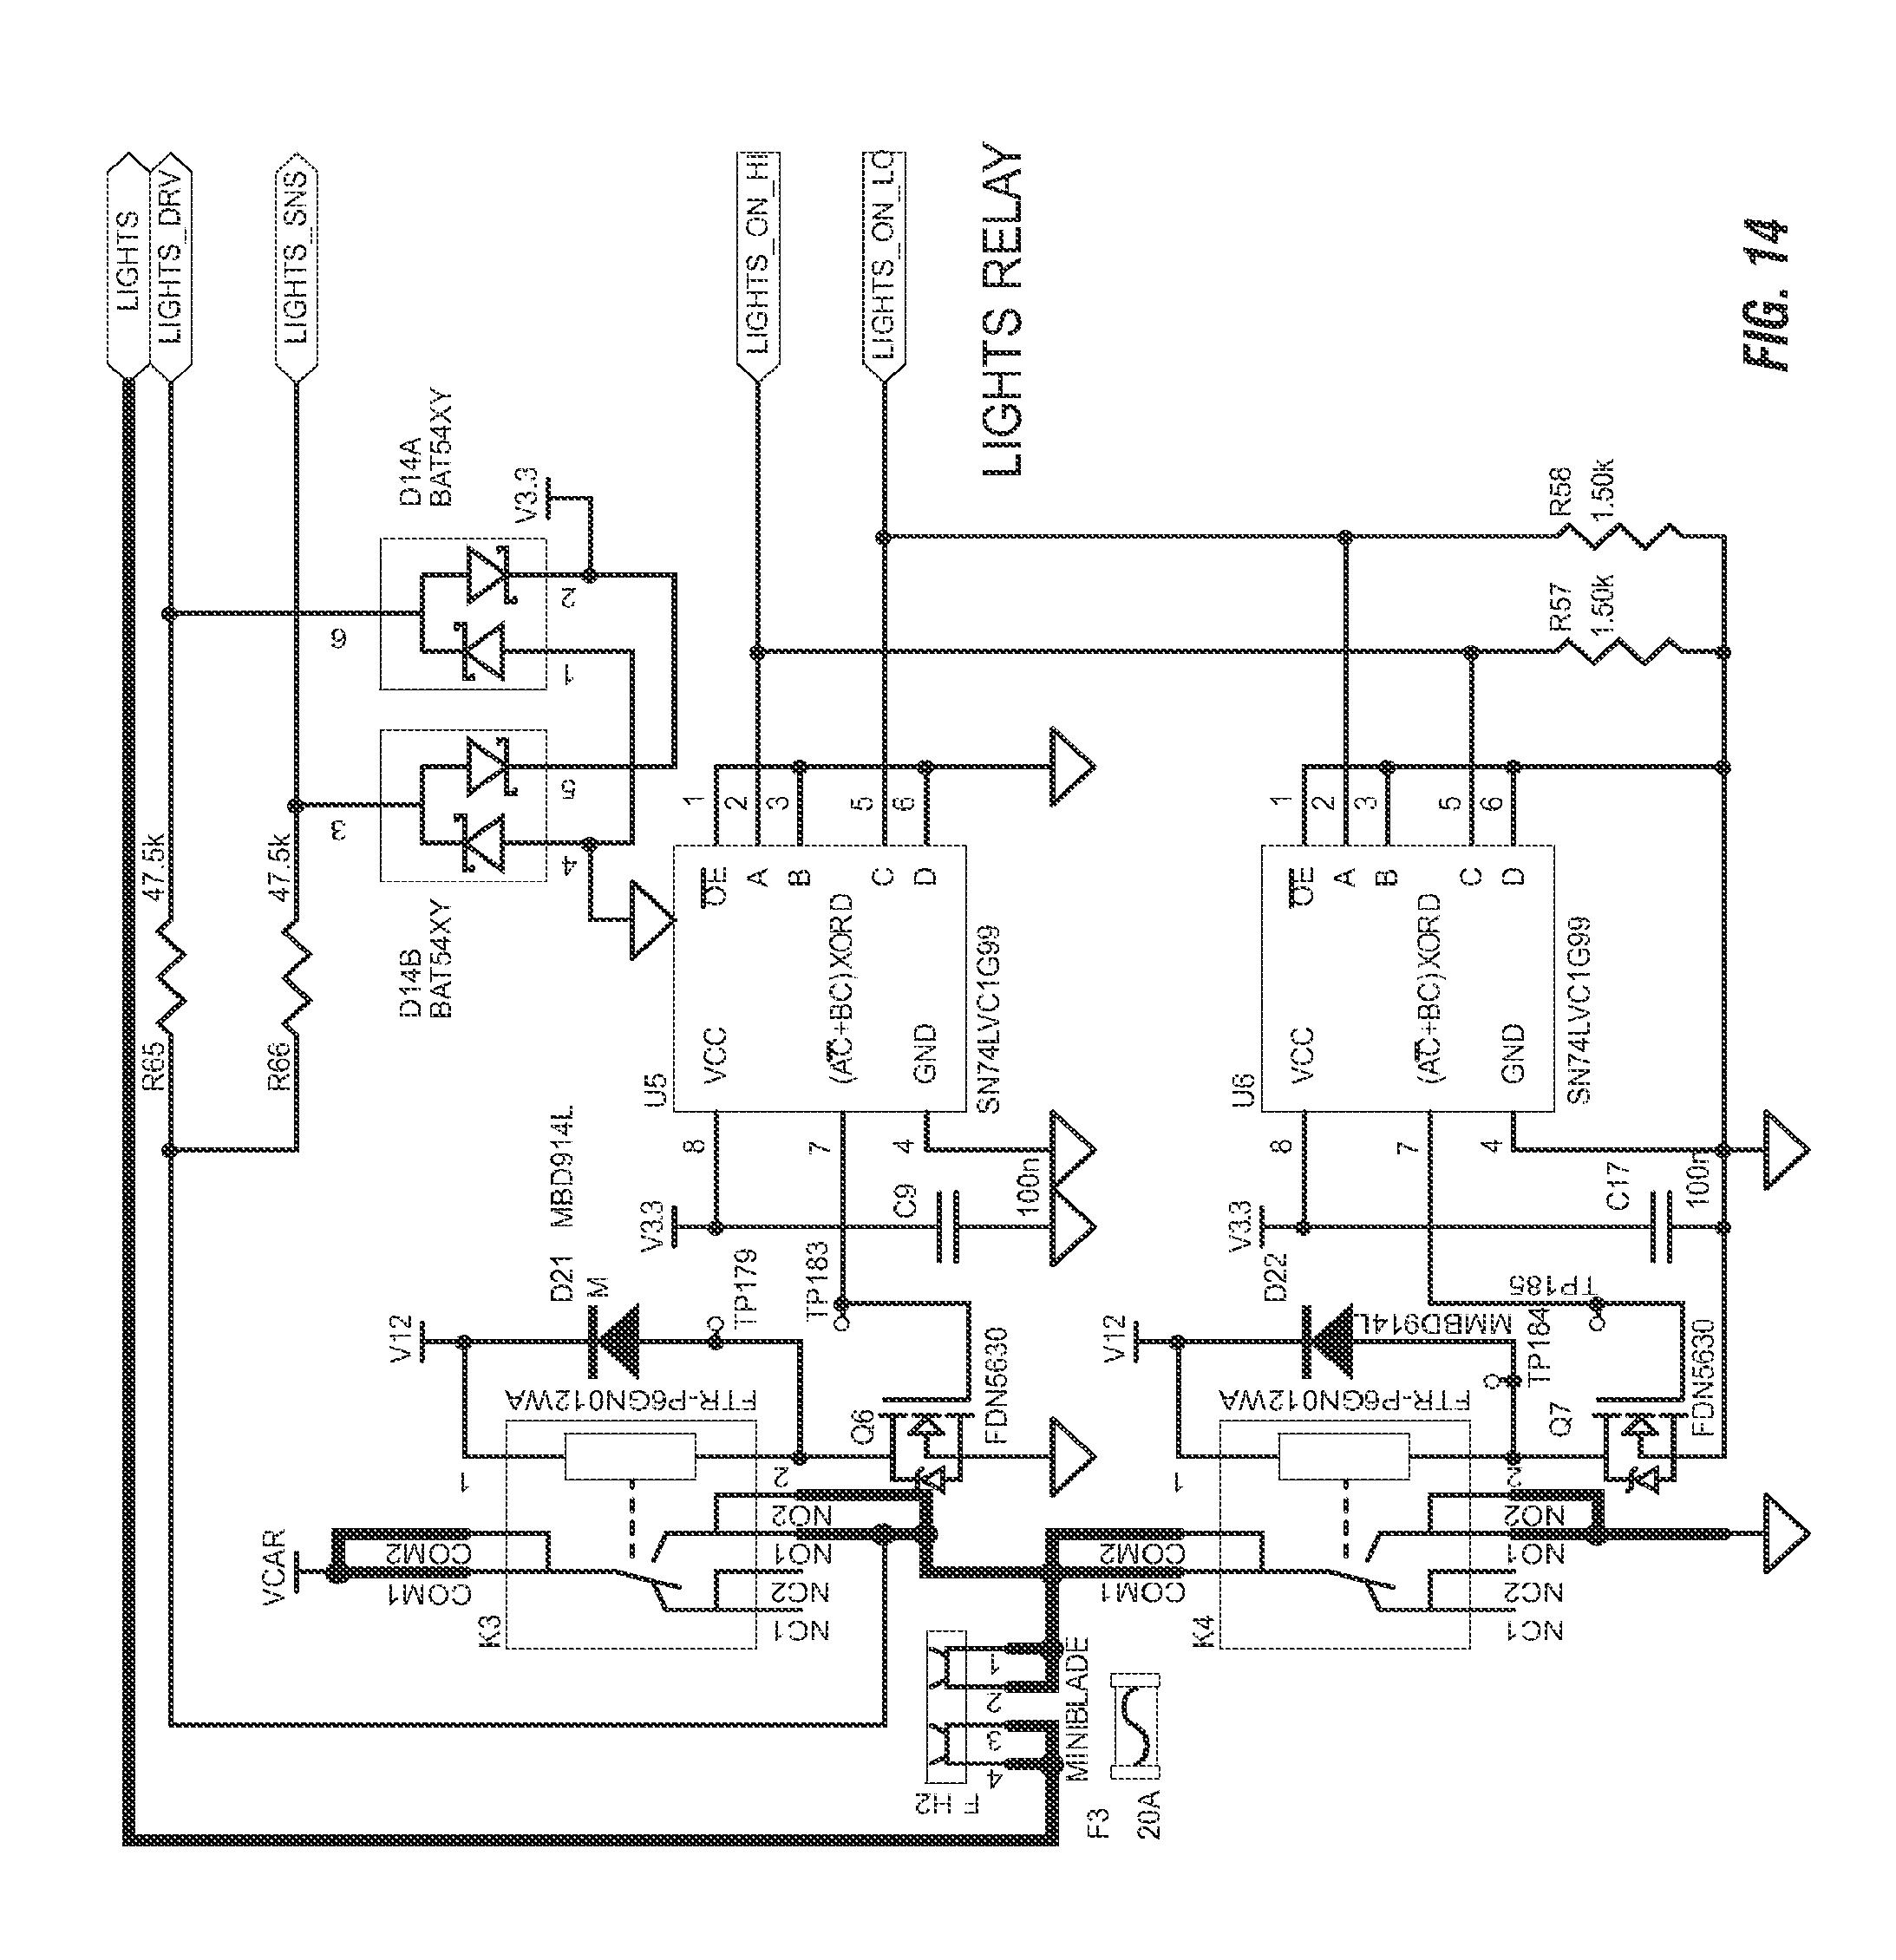 alcohol interlock wiring diagram